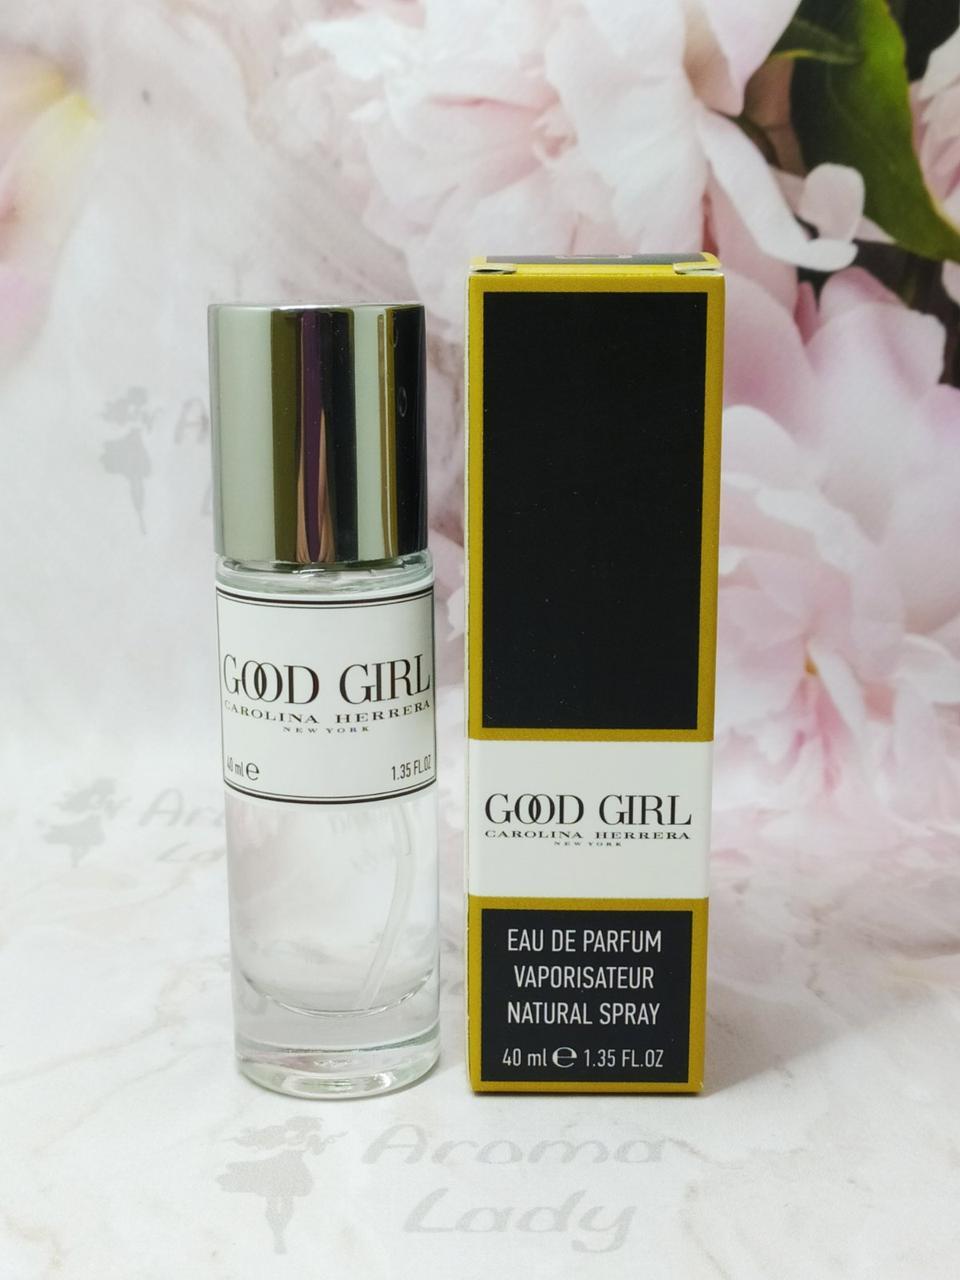 Женский мини парфюм Carolina Herrera Good Girl (Гуд Герл) 40 мл